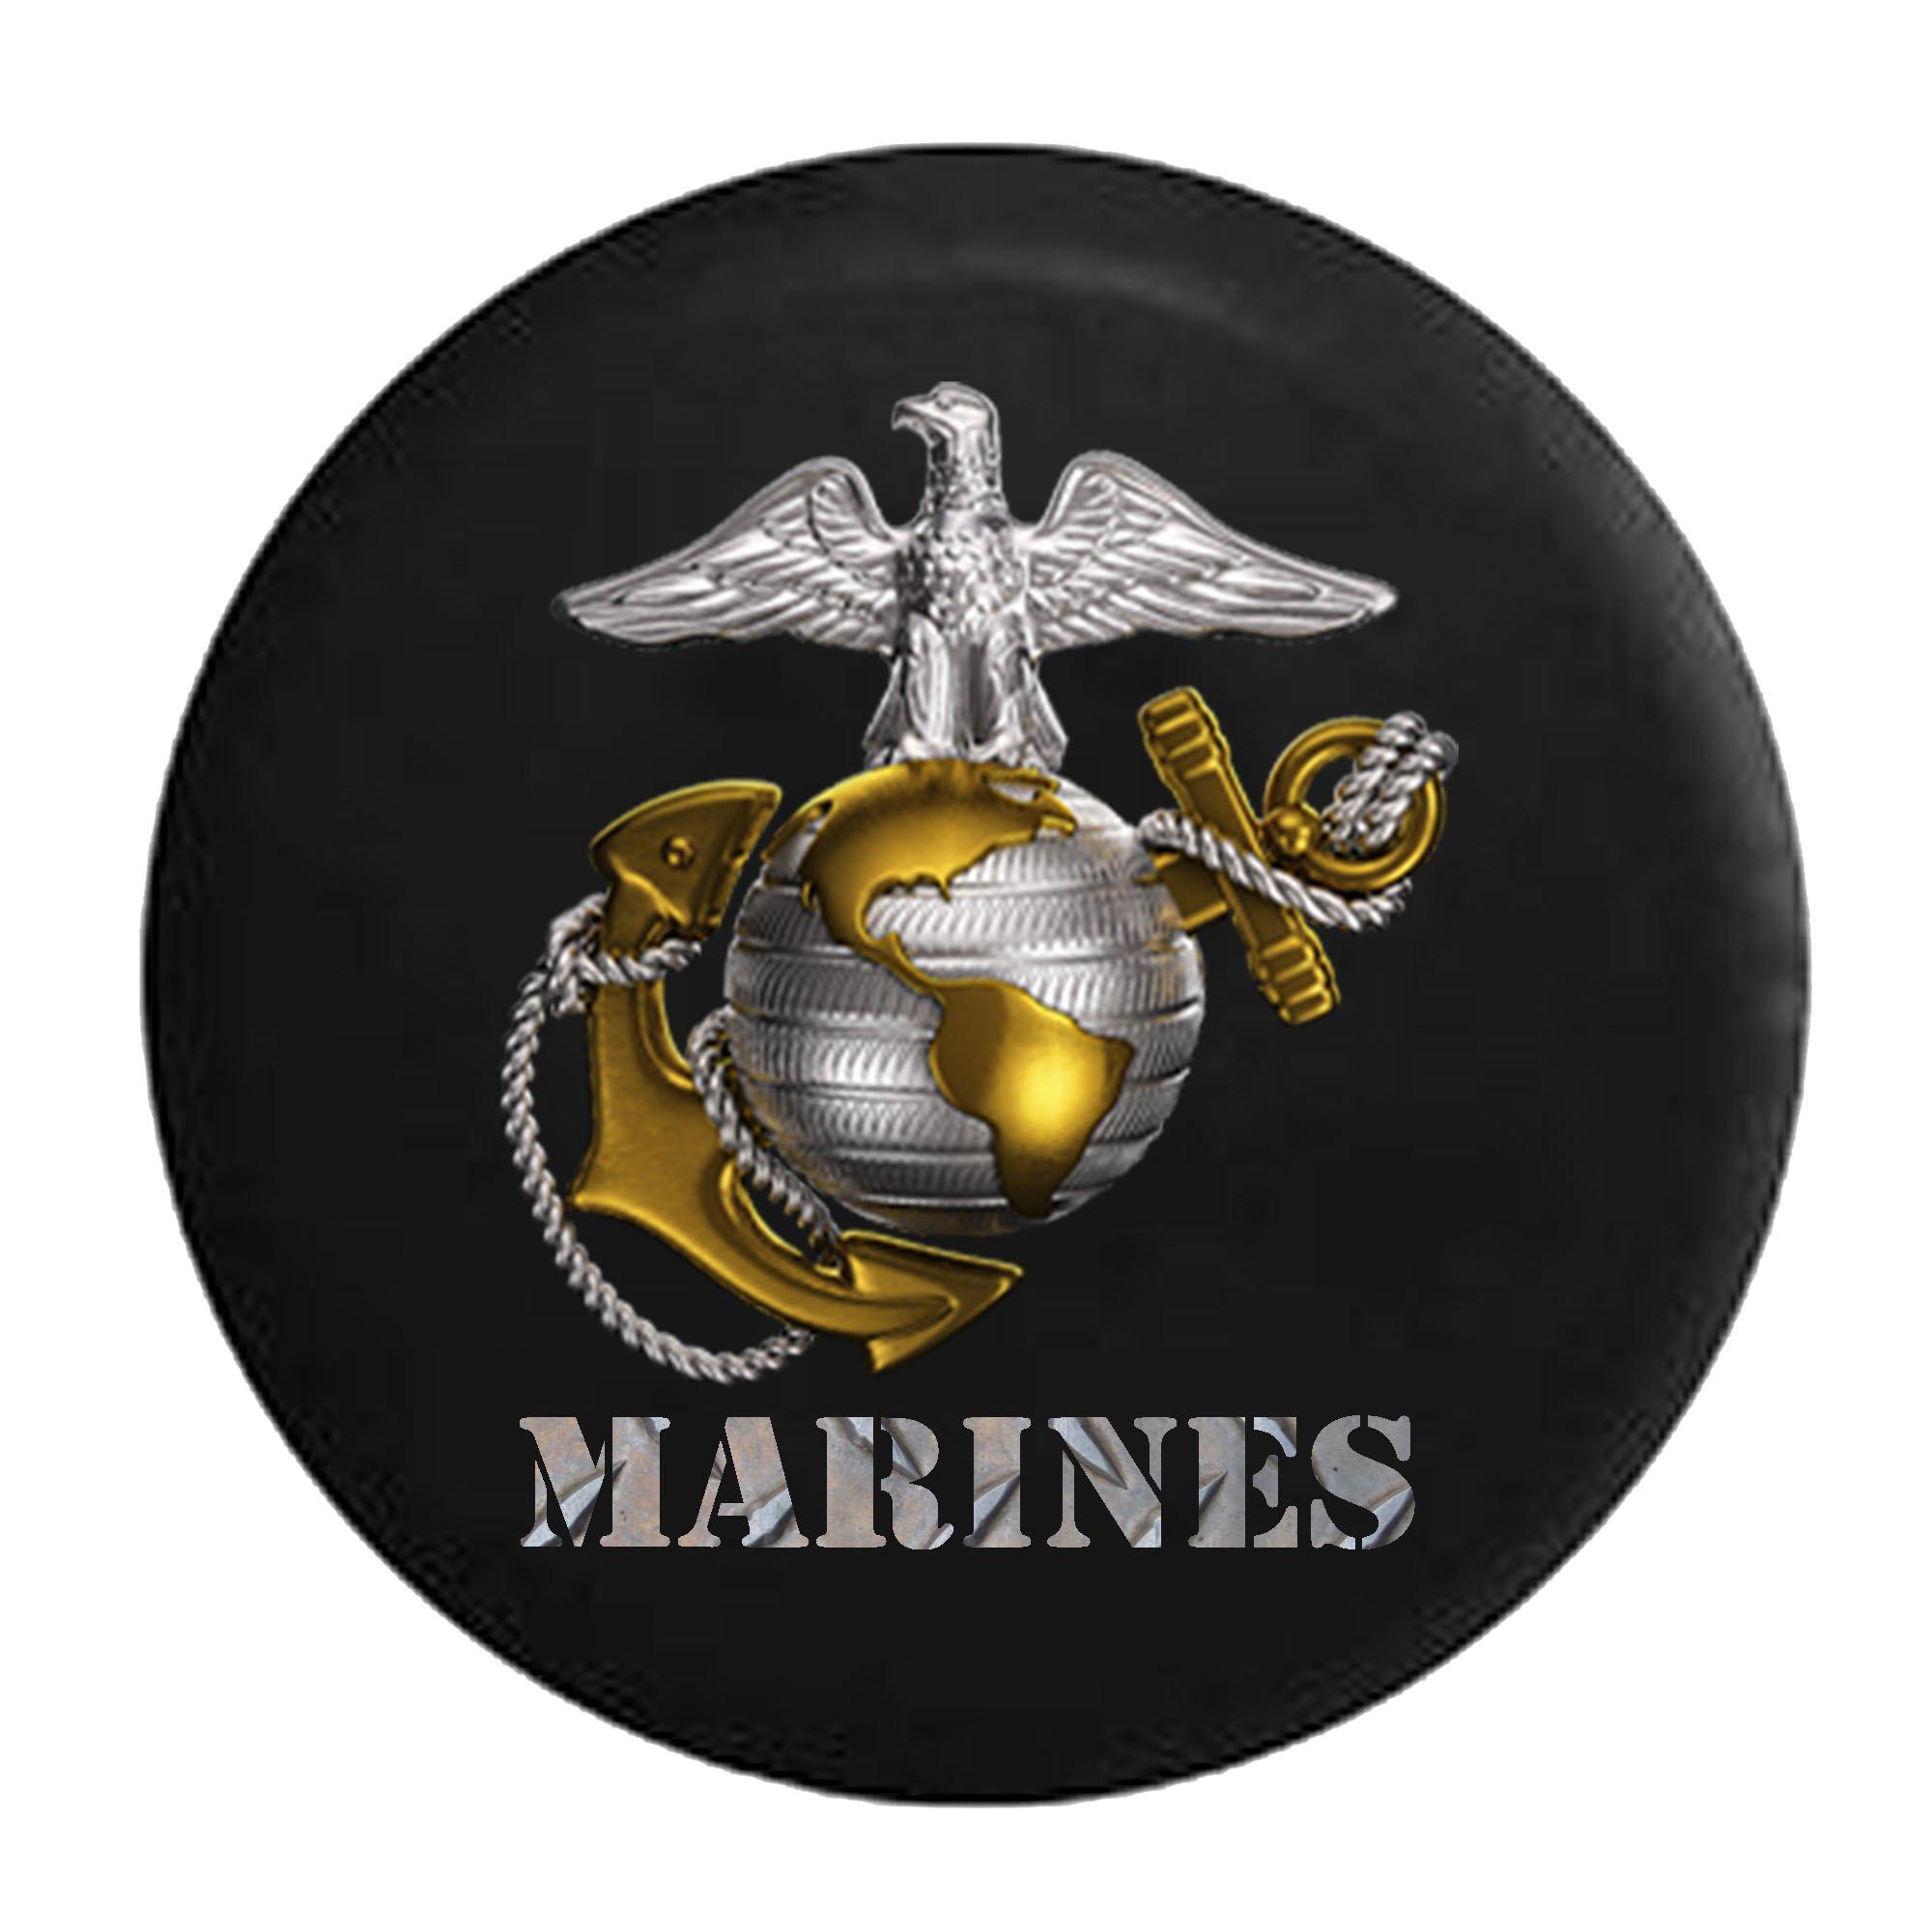 USMC United States Marine Corp Eagle Globe Anchor Emblem Spare Jeep Wrangler Camper SUV Tire Cover 30 in